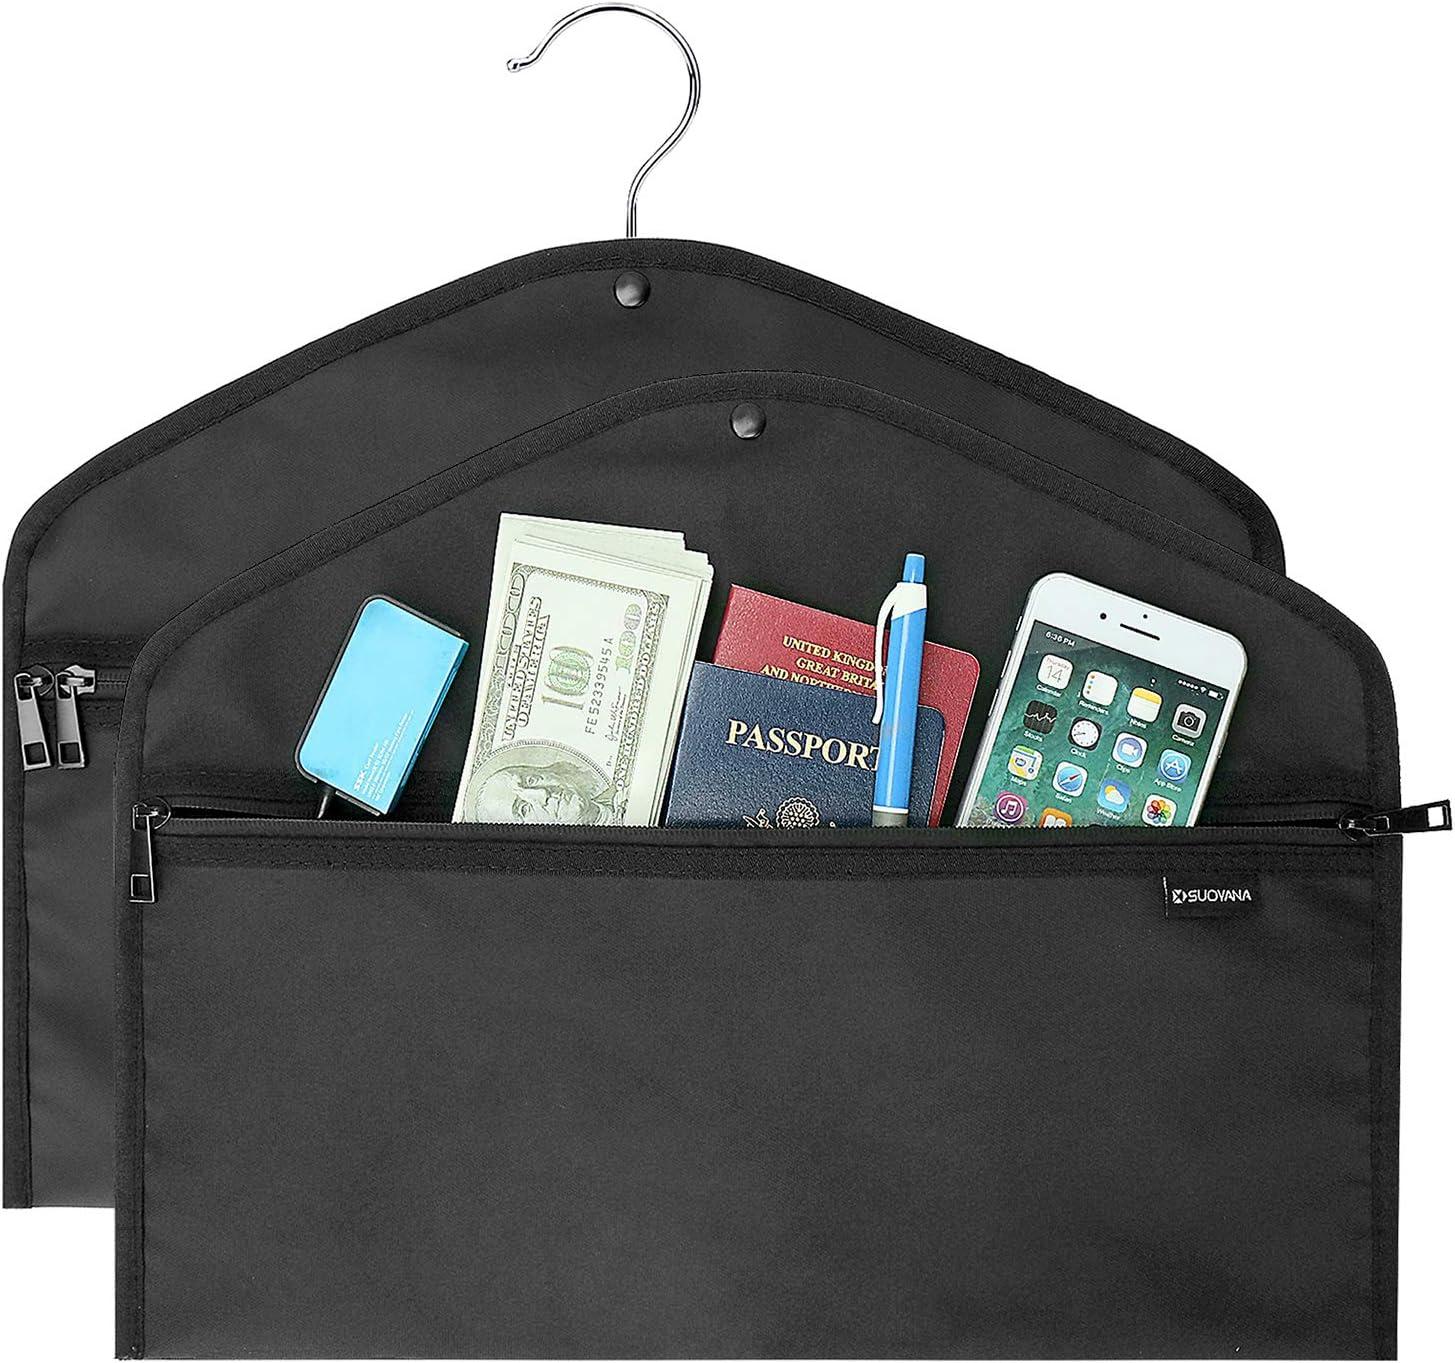 Hanger Diversion Safe Bag,Button Design Fit for Every Hanger,Fireproof Waterproof Double Zipper Keep Secret in Safe for Home,Travel (2 Pack)